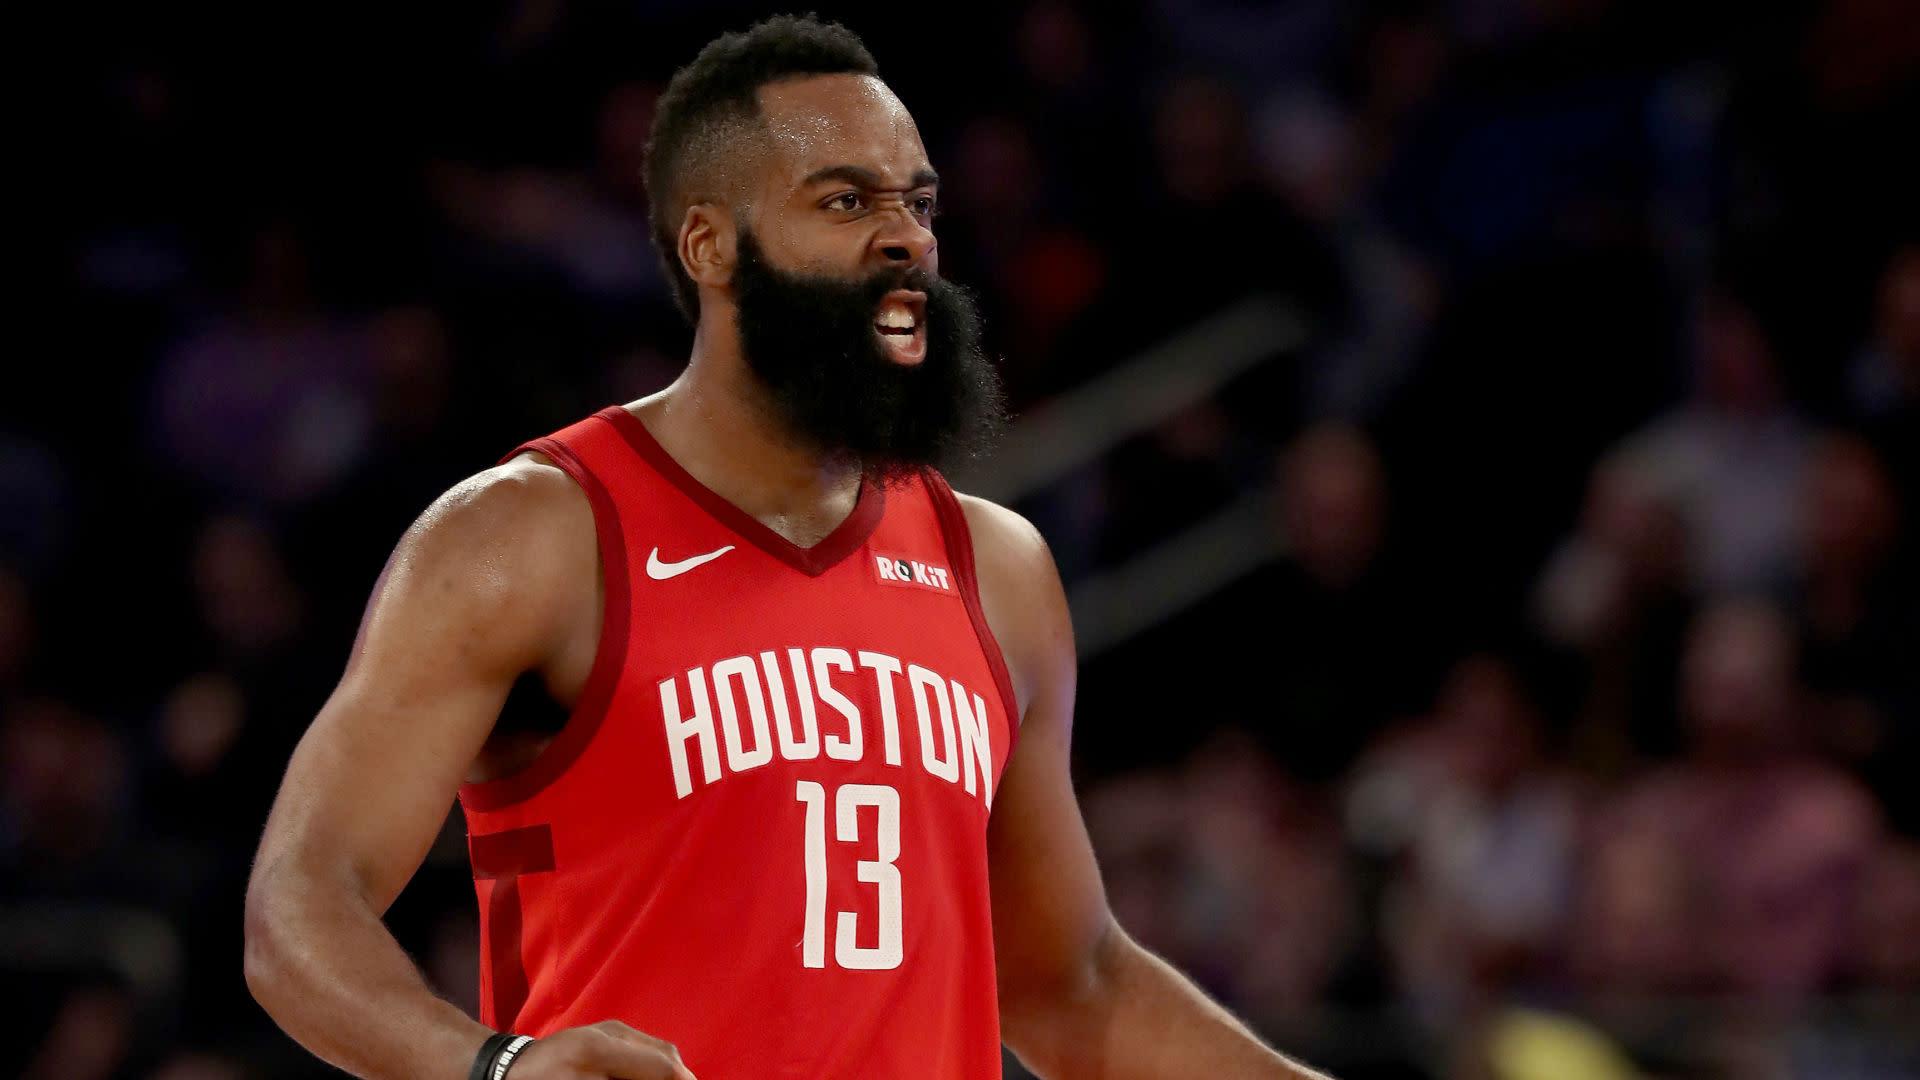 Harden Continues Scoring Form Rockets Top Raptors In Houston